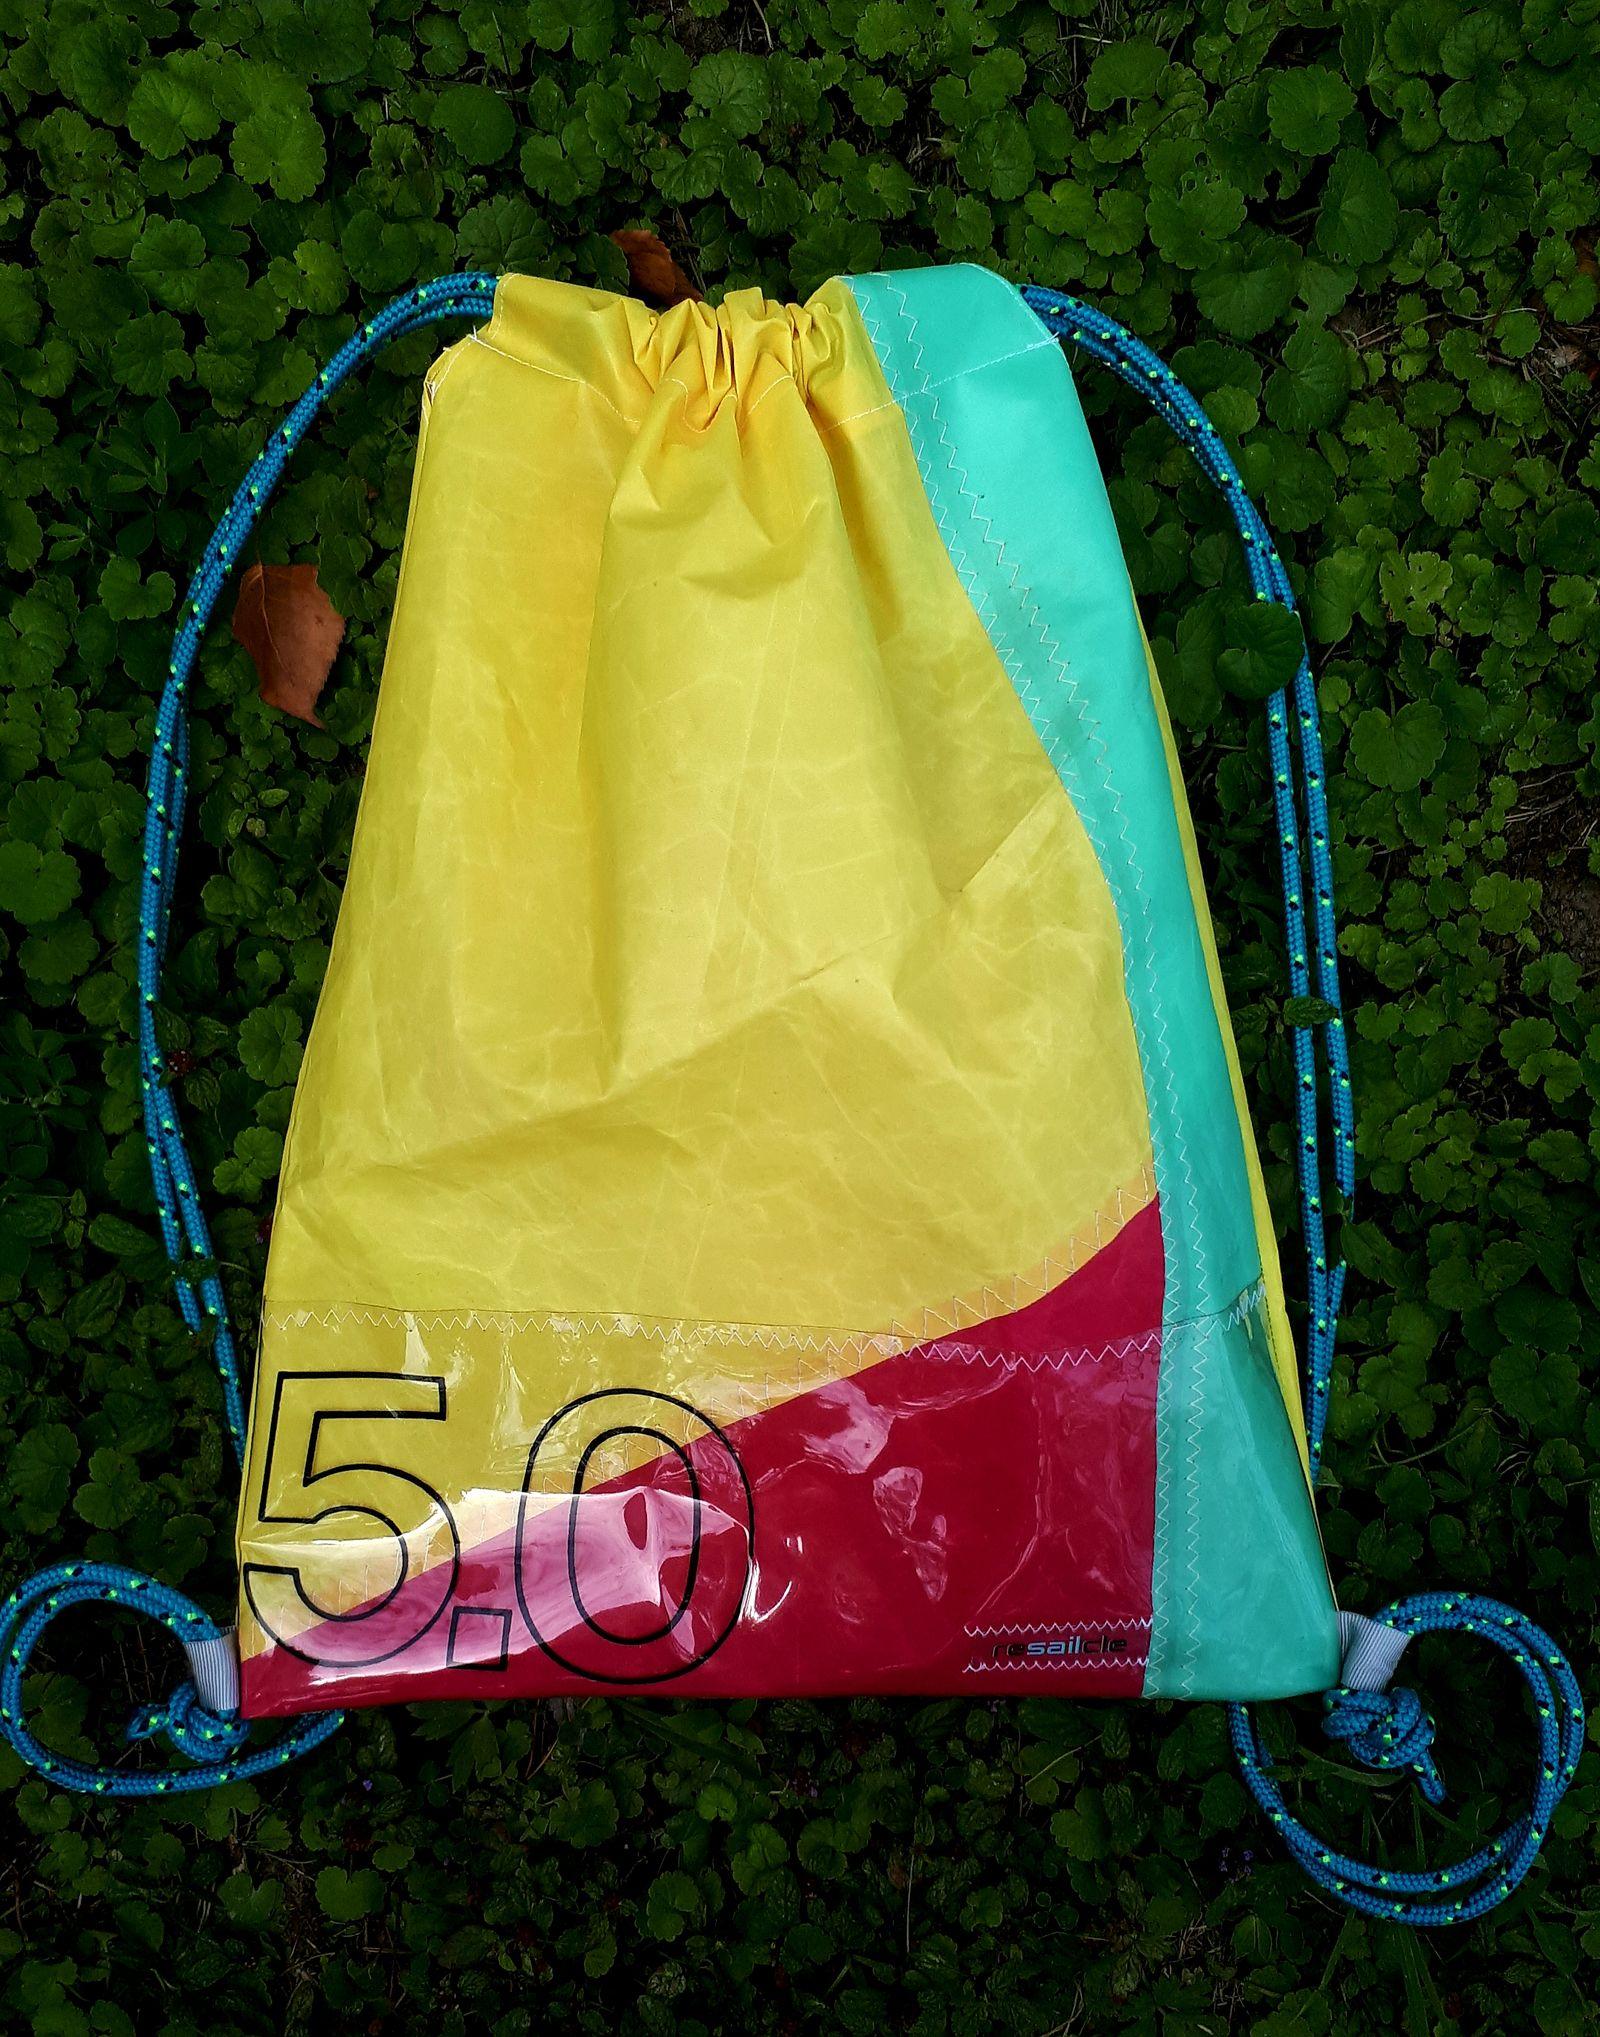 ReSailCle 5.0 Gym bag